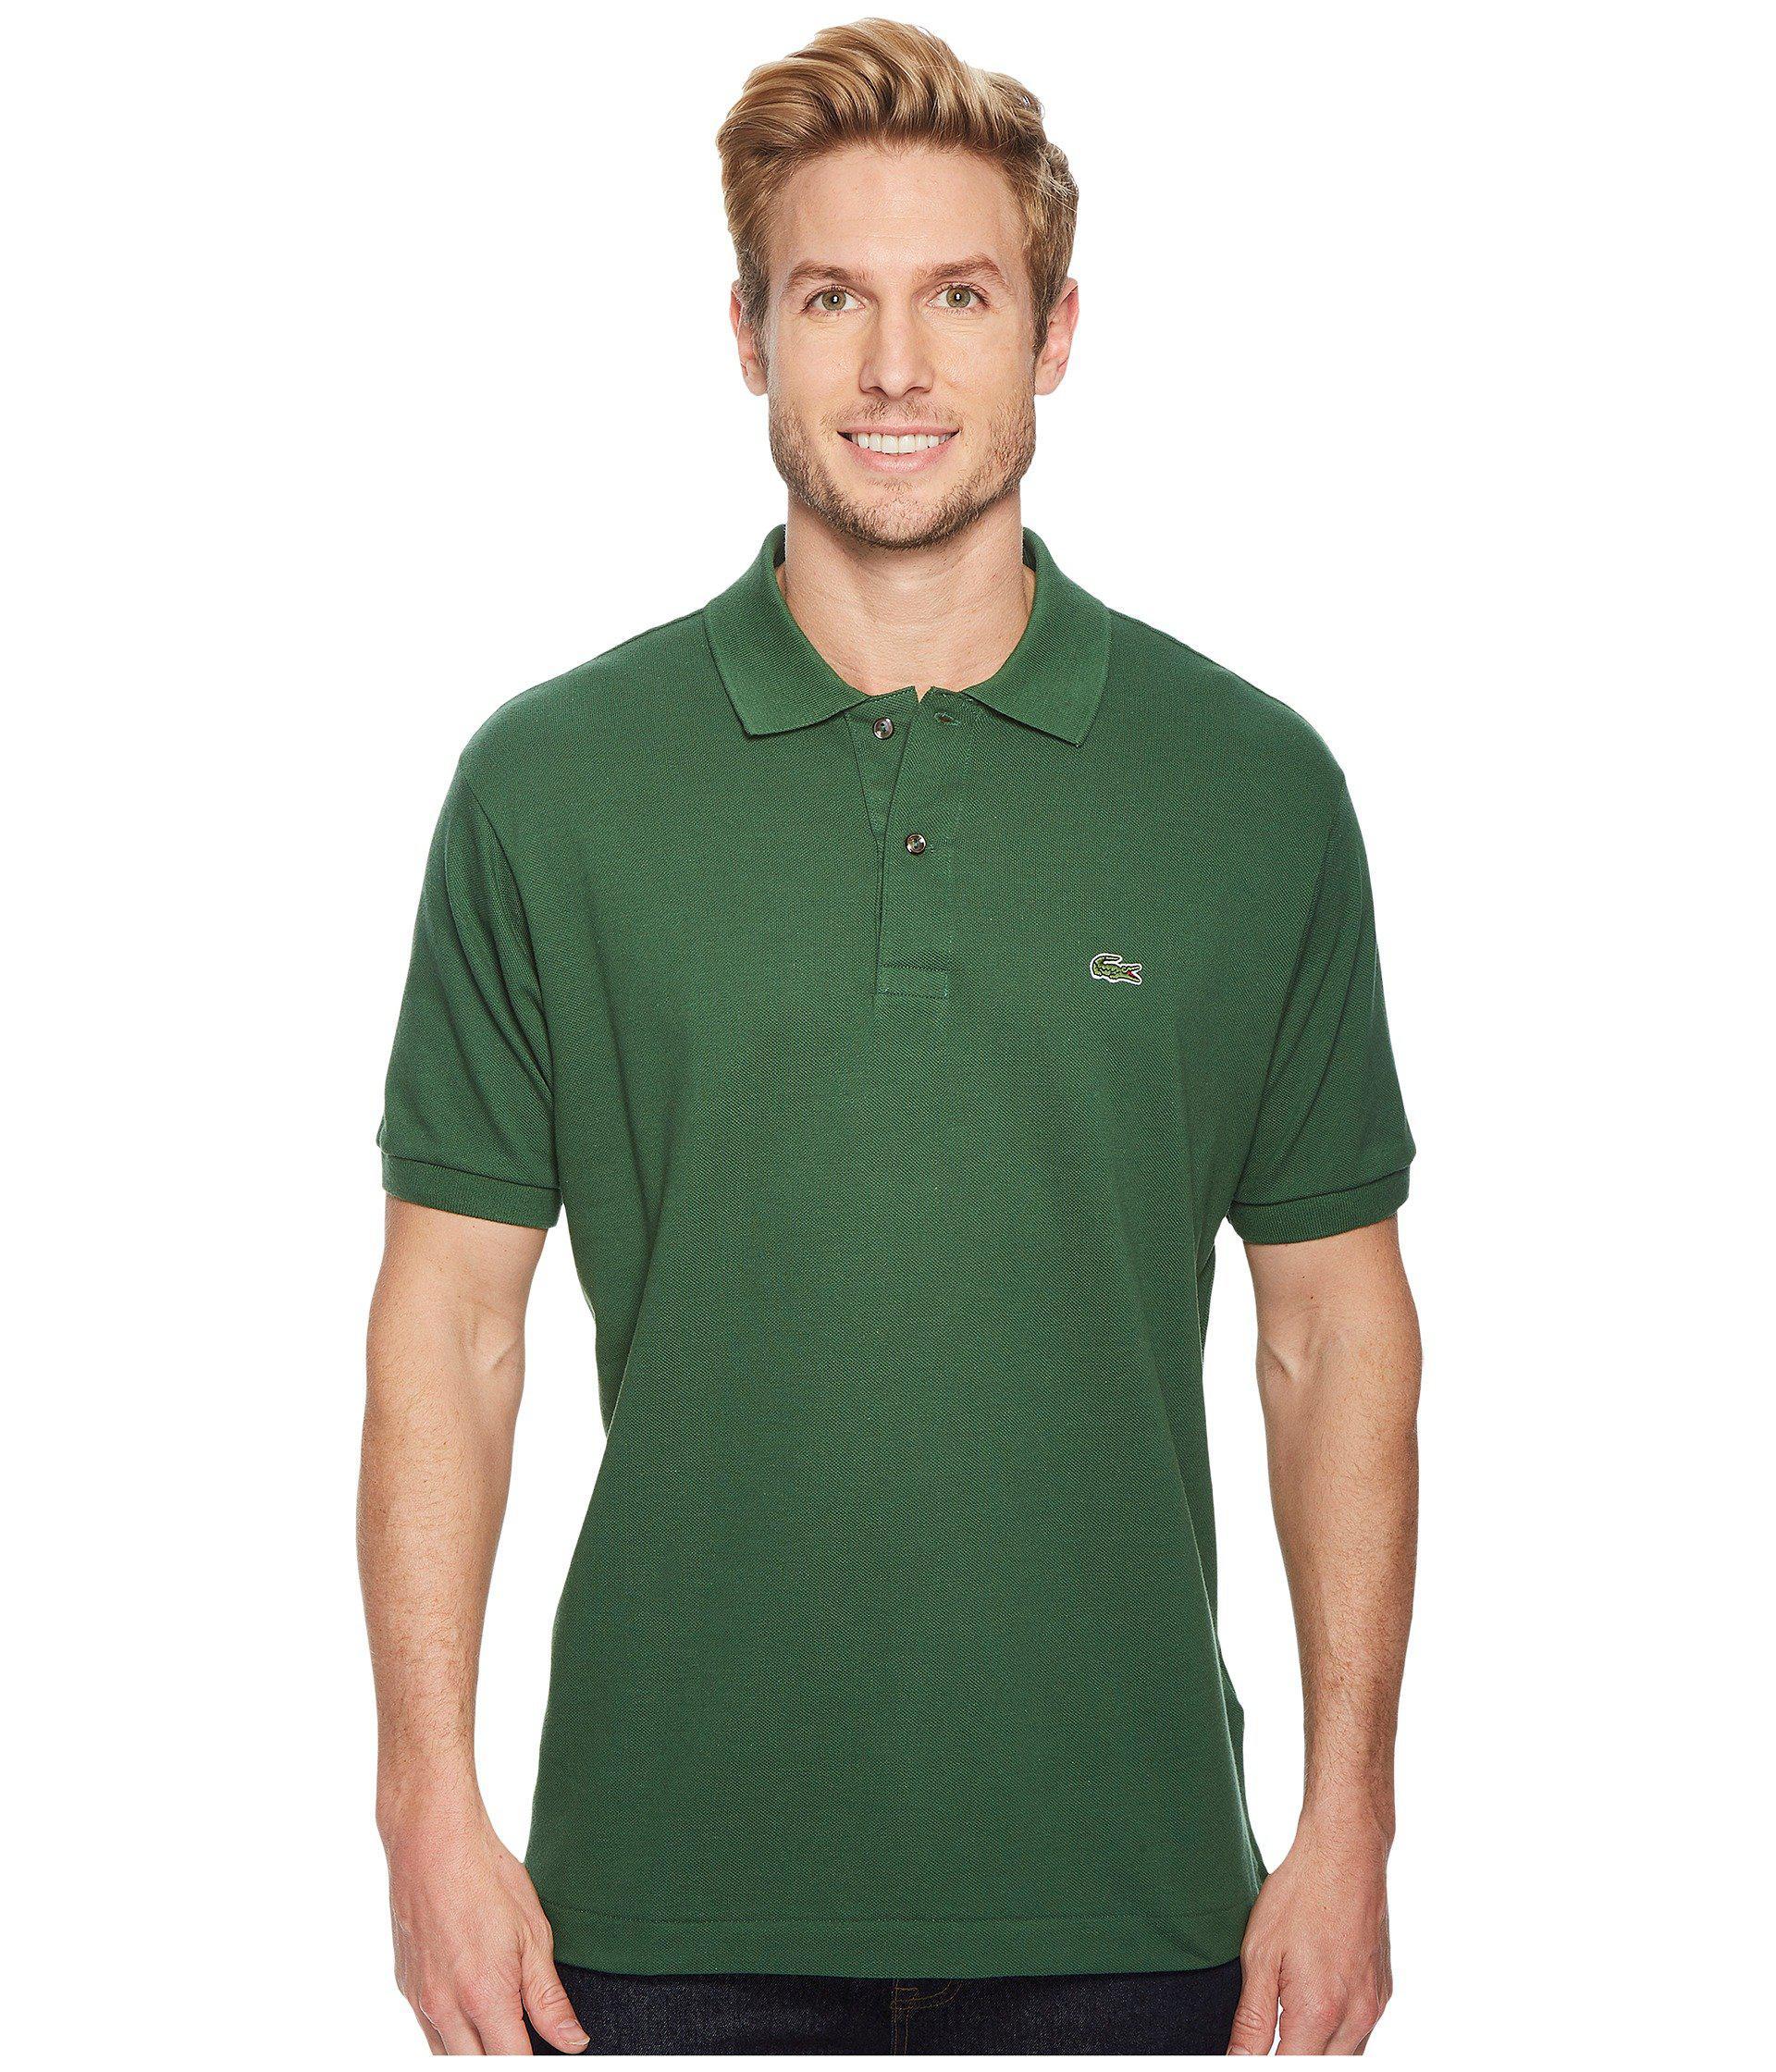 fe059335 Lyst - Lacoste Short Sleeve Classic Pique Polo Shirt (green) Men's ...